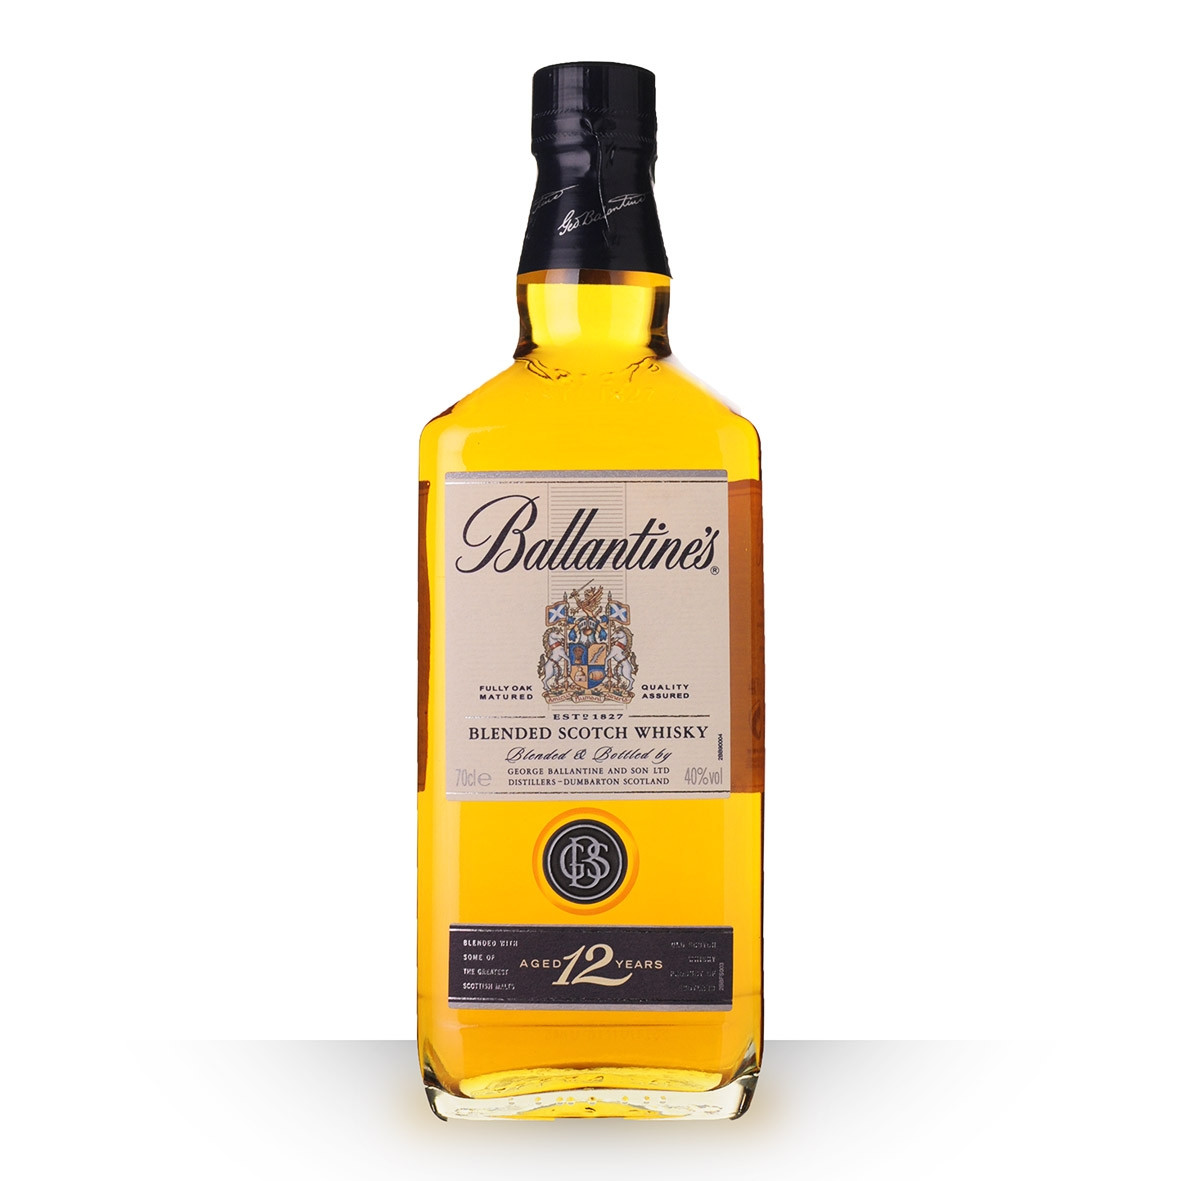 Whisky Ballantines 12 ans 70cl www.odyssee-vins.com